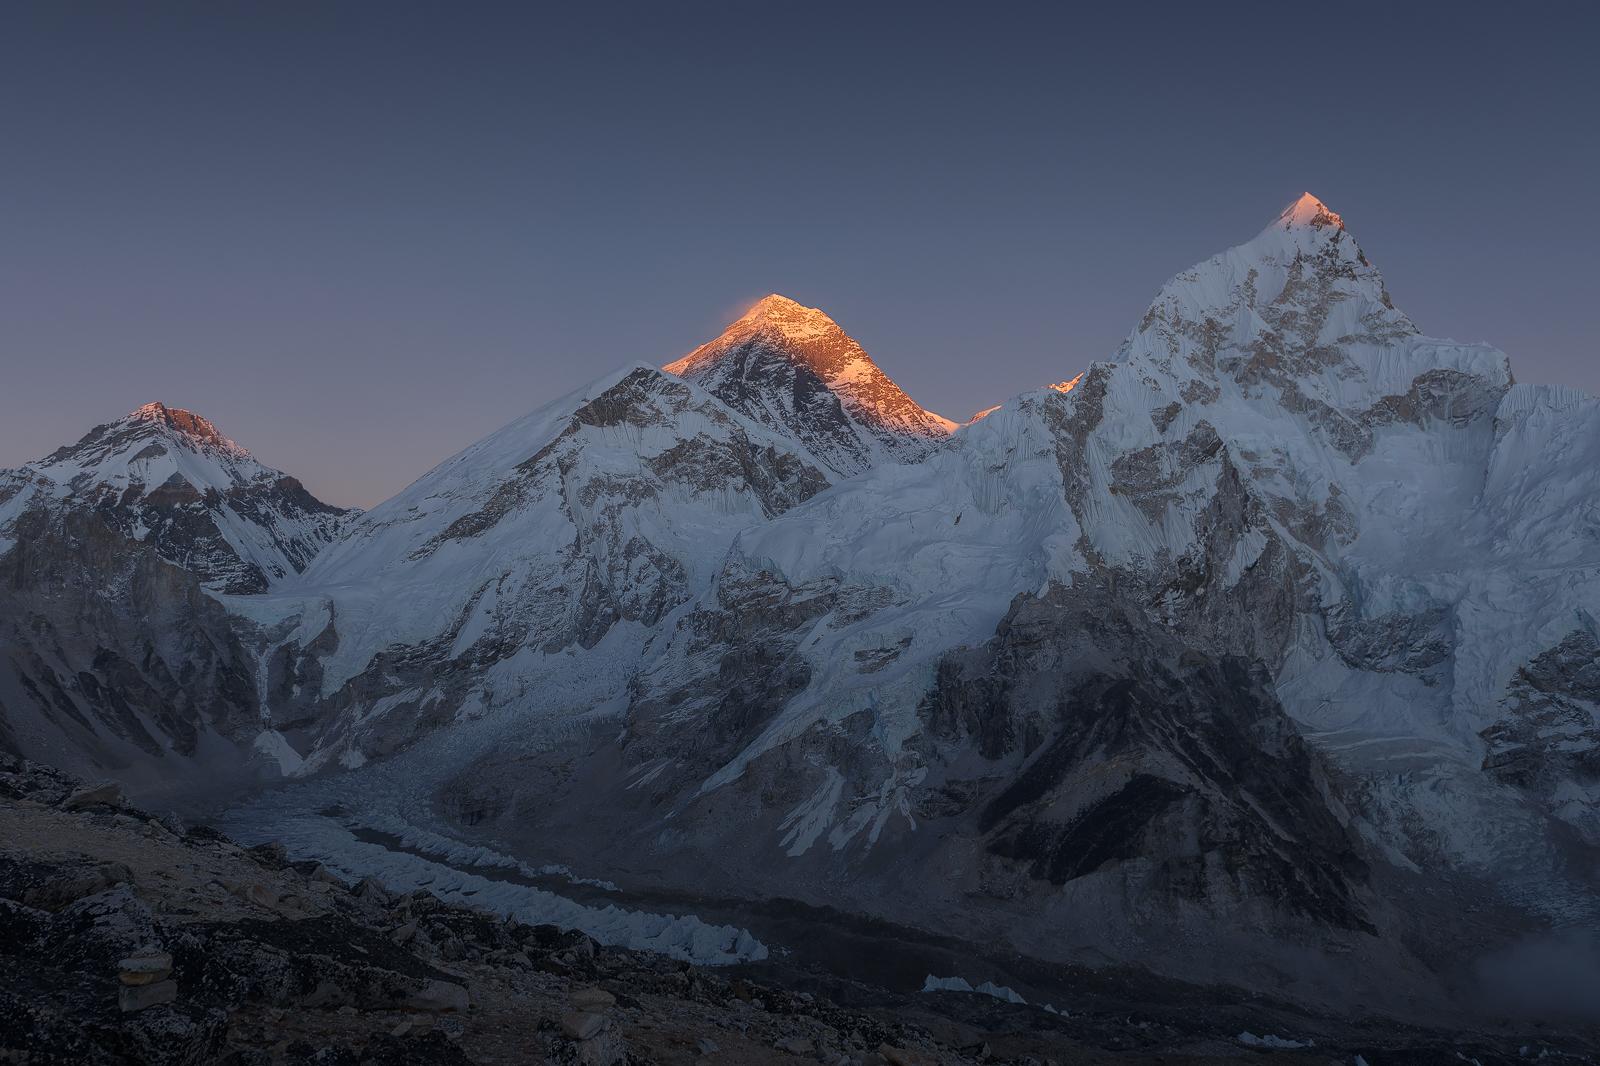 Atardecer en el Everest (Nepal)